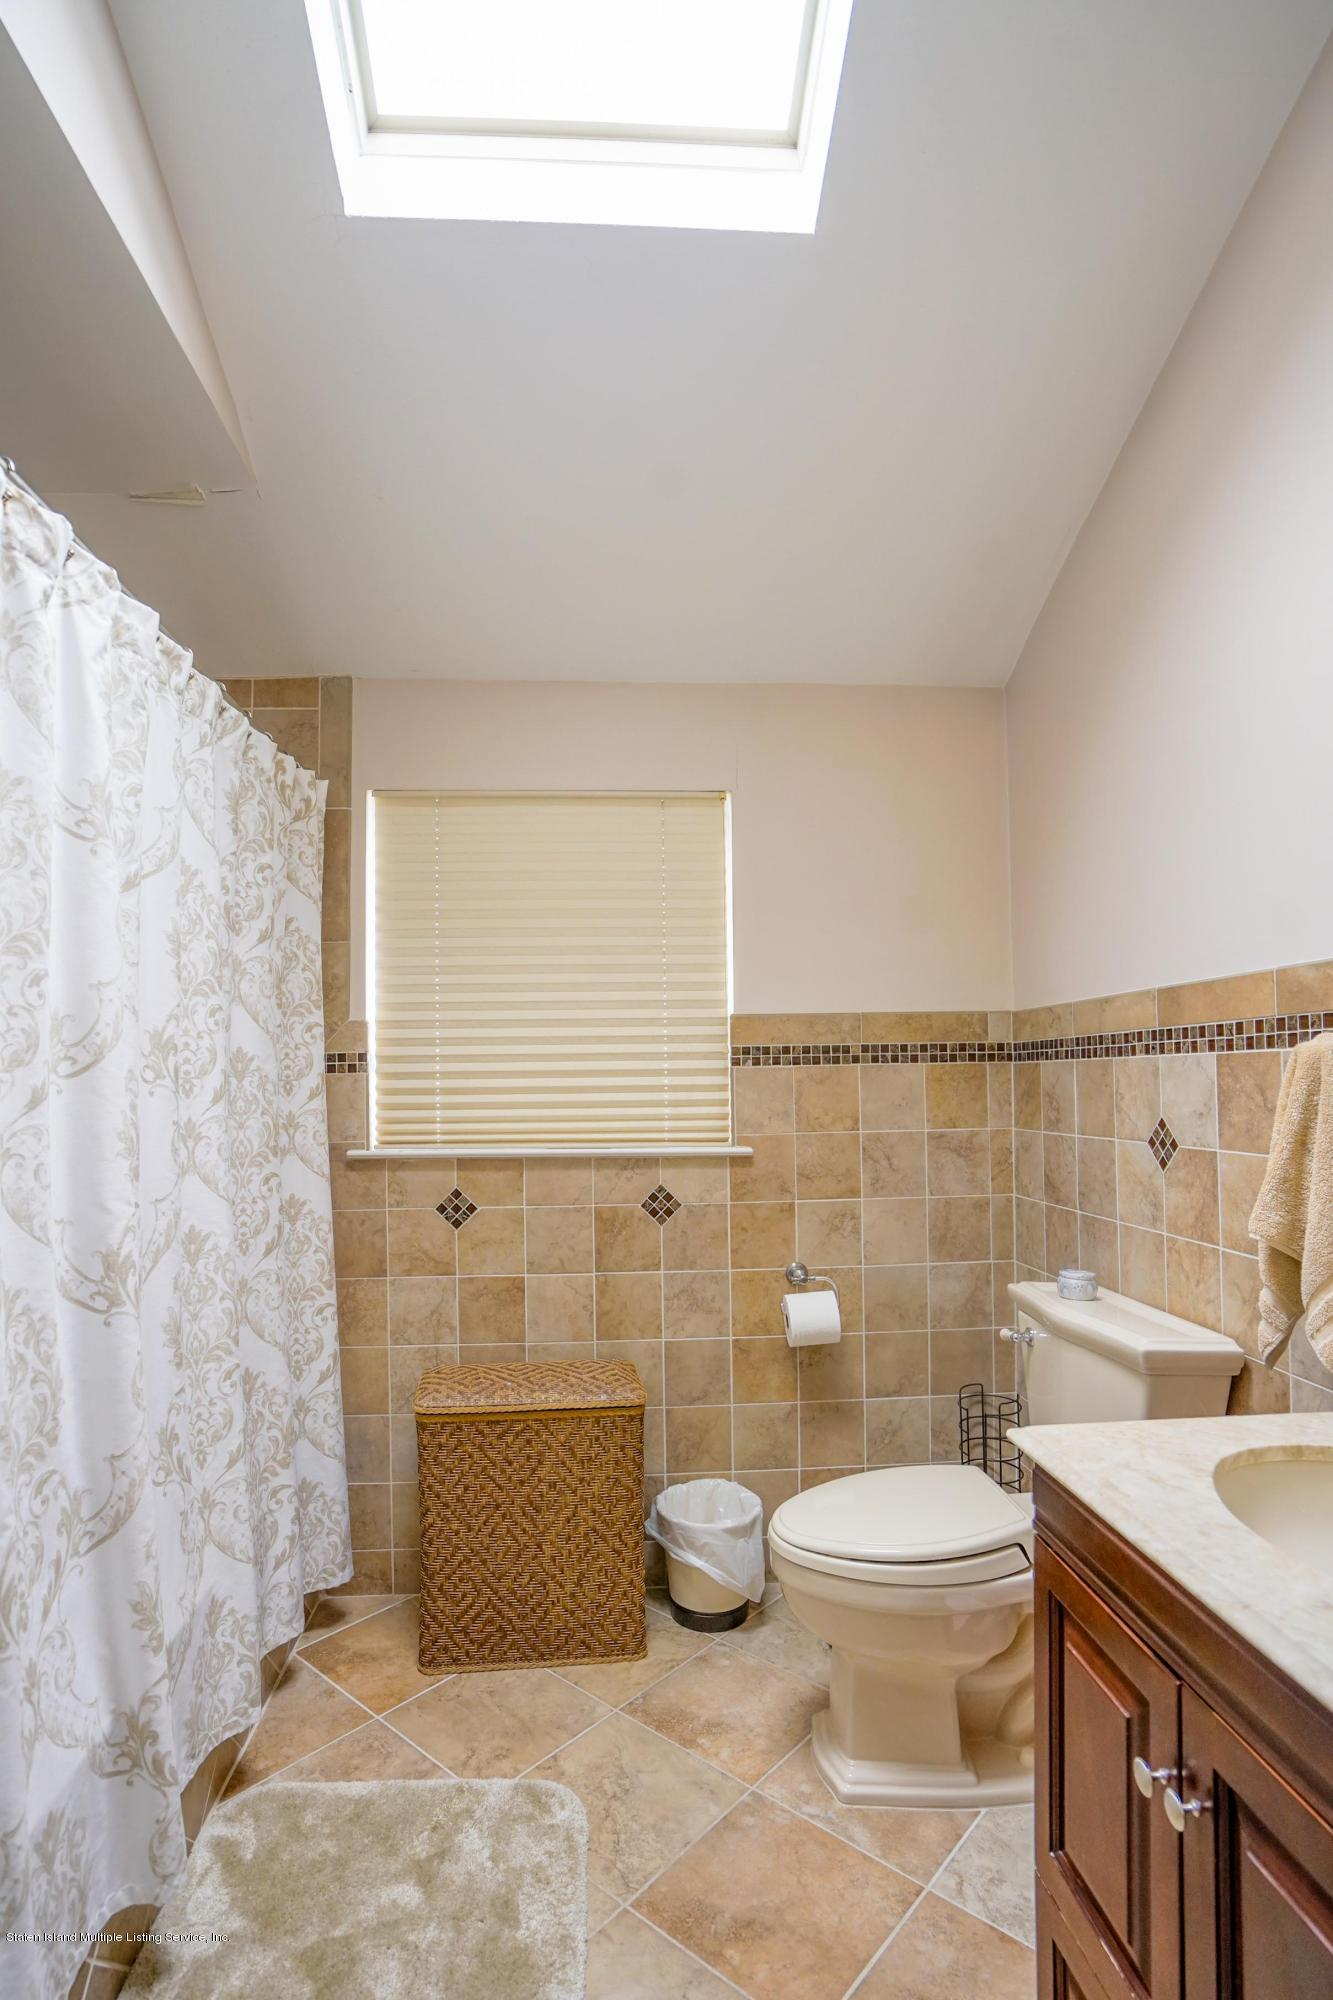 Single Family - Semi-Attached 51 Shiloh Street  Staten Island, NY 10314, MLS-1128244-15